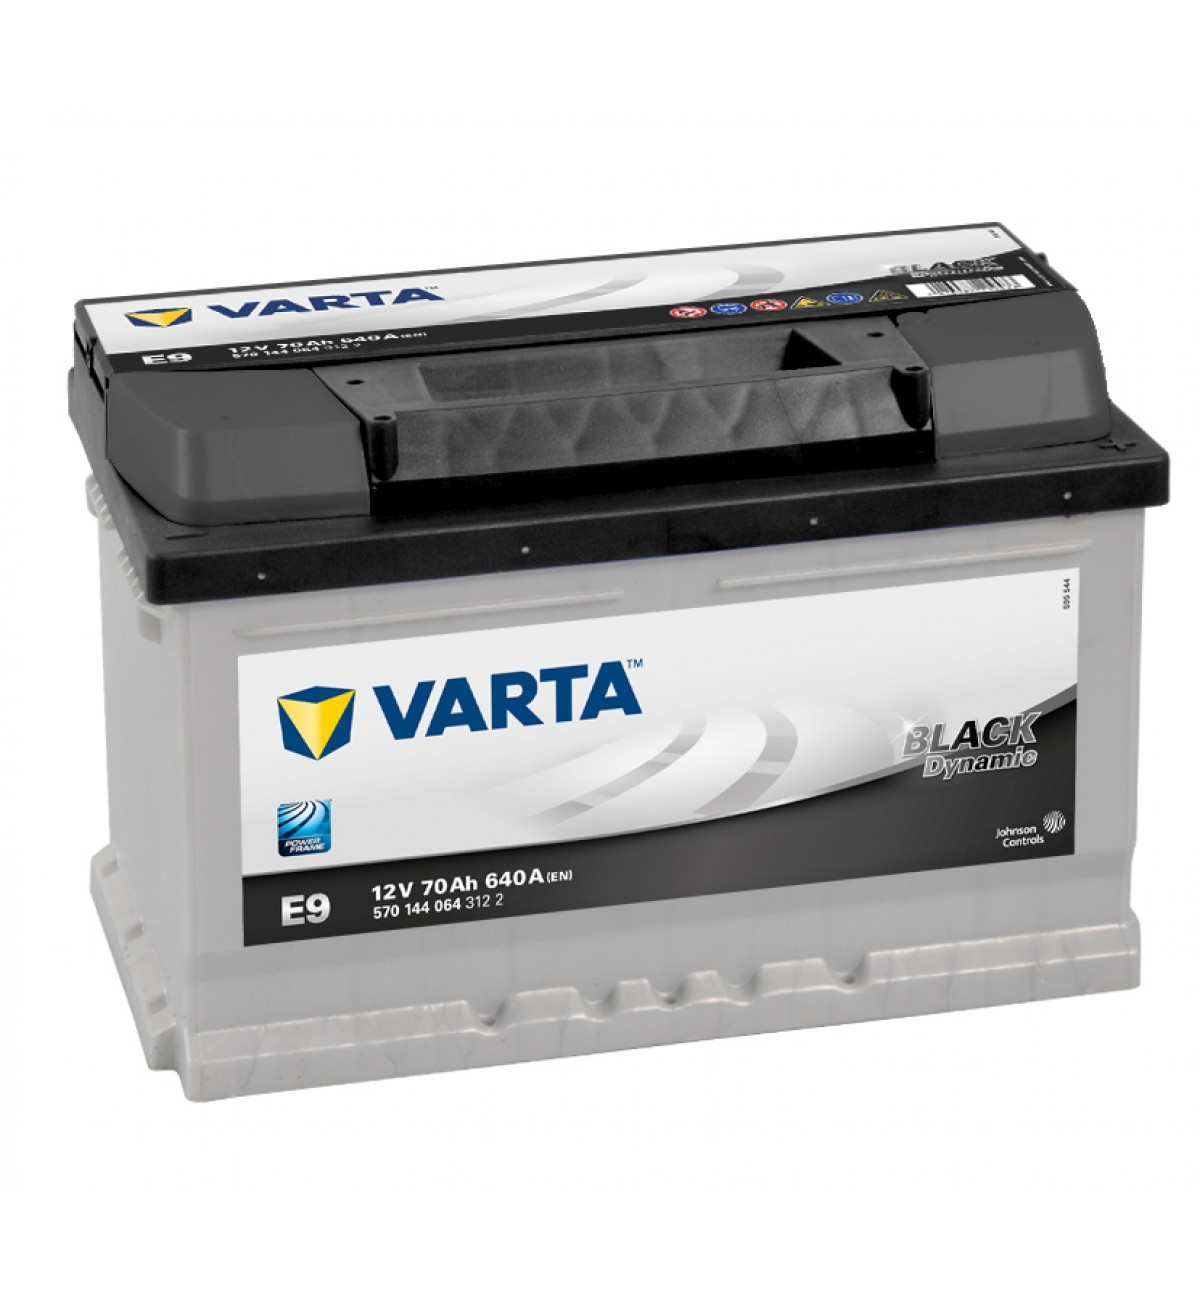 Купить Аккумулятор Varta Black Dynamic 70Ah (0) 640A (E9)